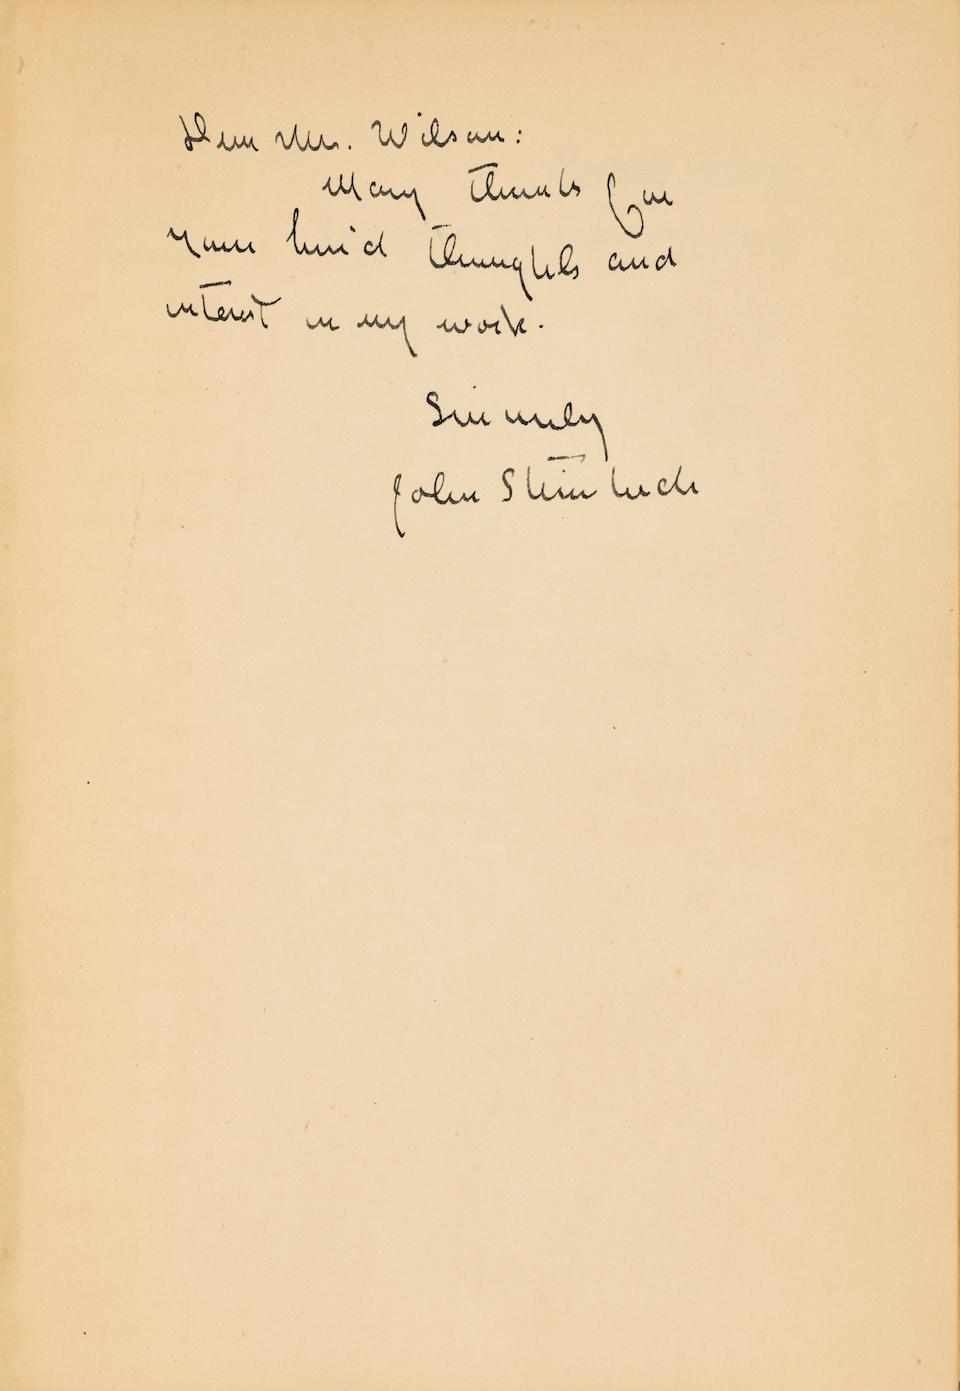 STEINBECK, JOHN. 1902-1968. Bombs Away: The Story of a Bomber Team. New York: The Viking Press, 1942.